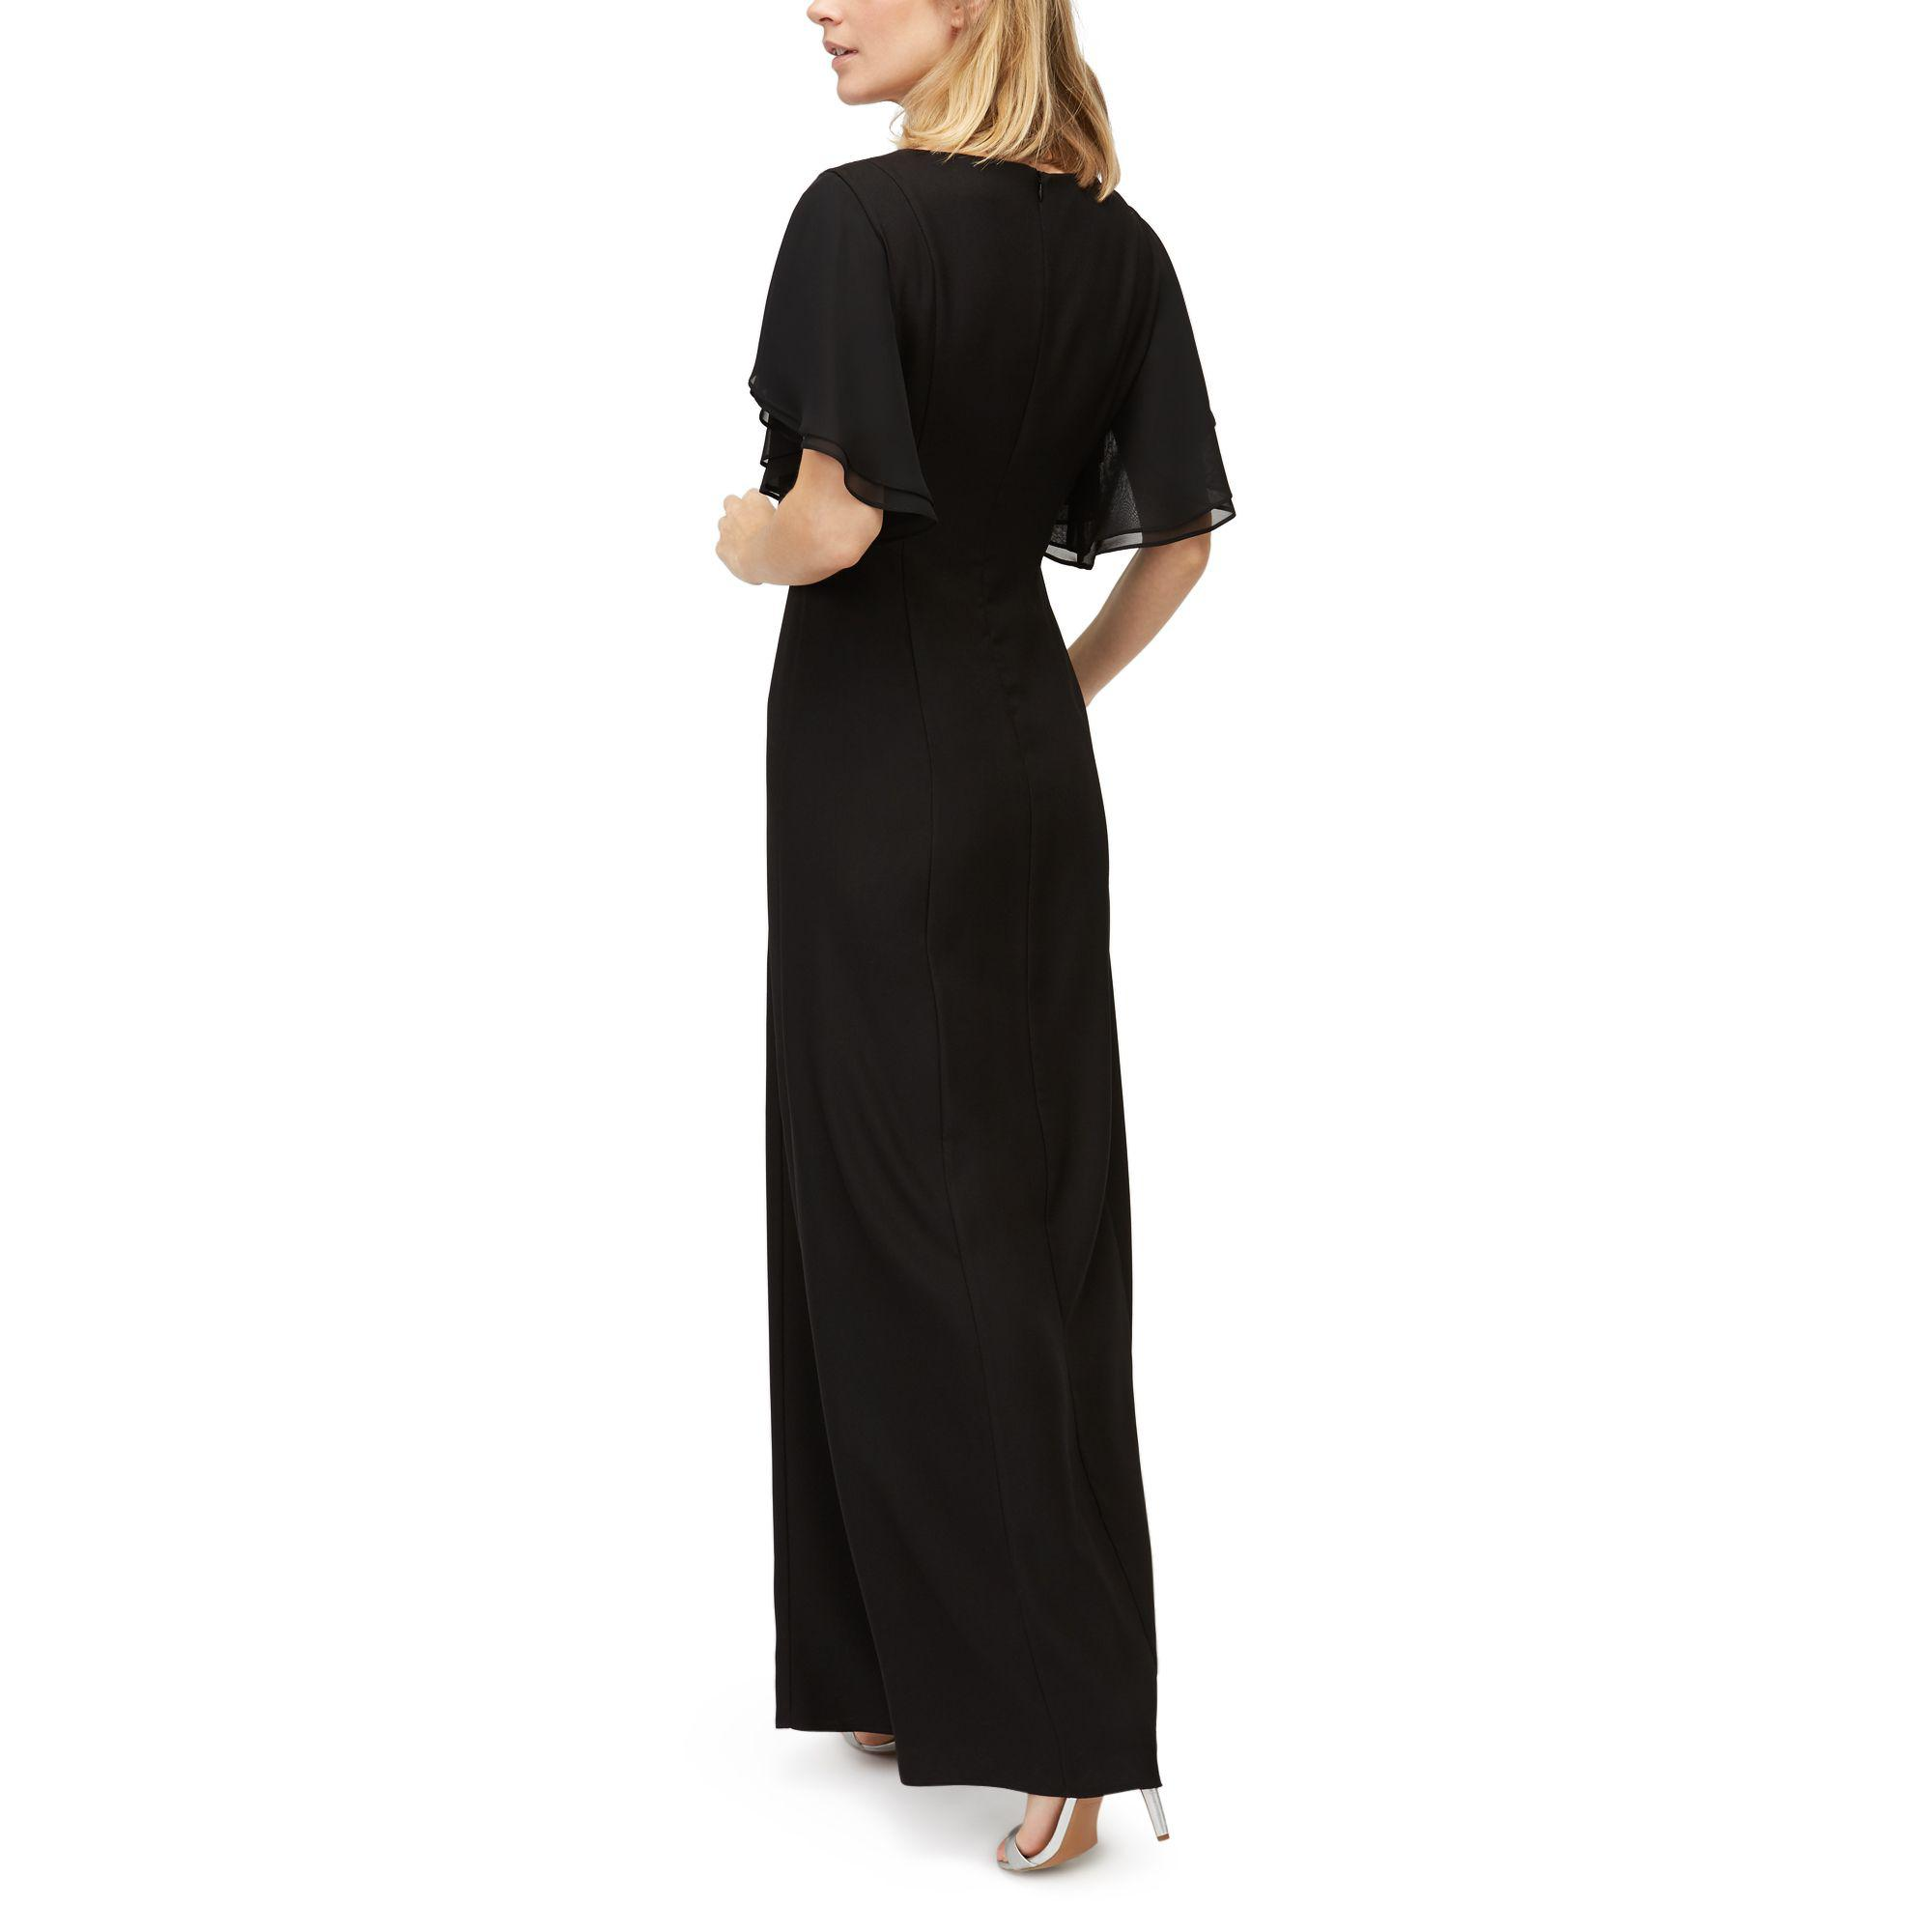 Jacques Vert Crepe Angel Sleeve Maxi Dress in Black